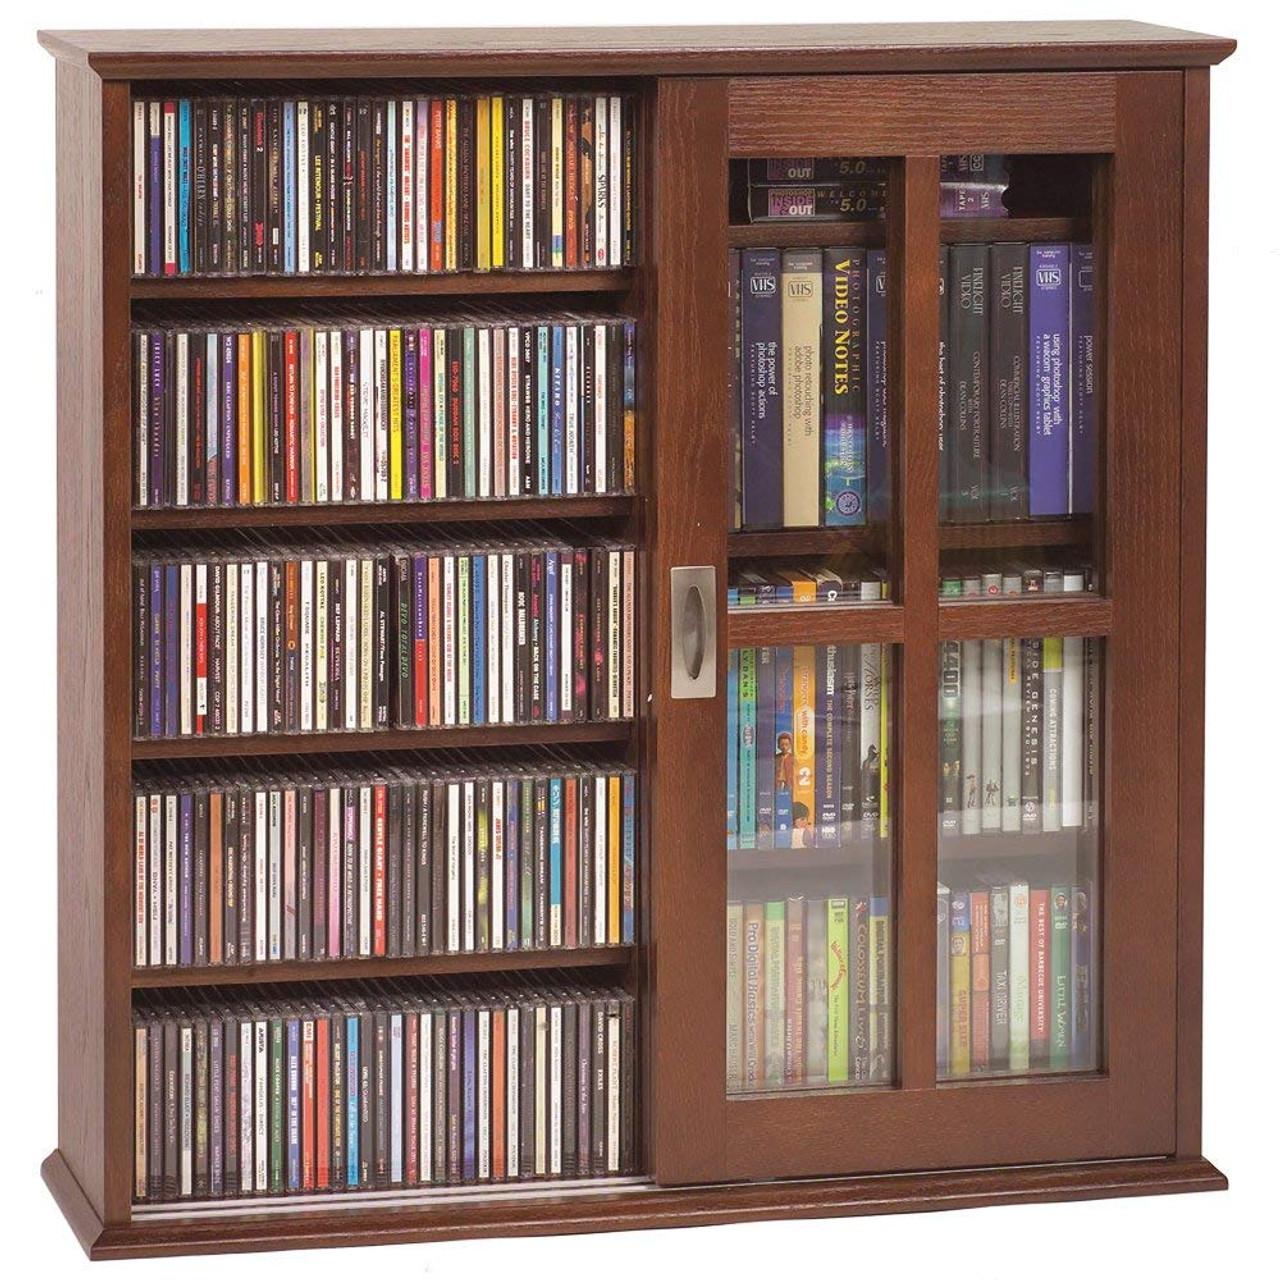 Download Wall Dvd Shelf Wood Background